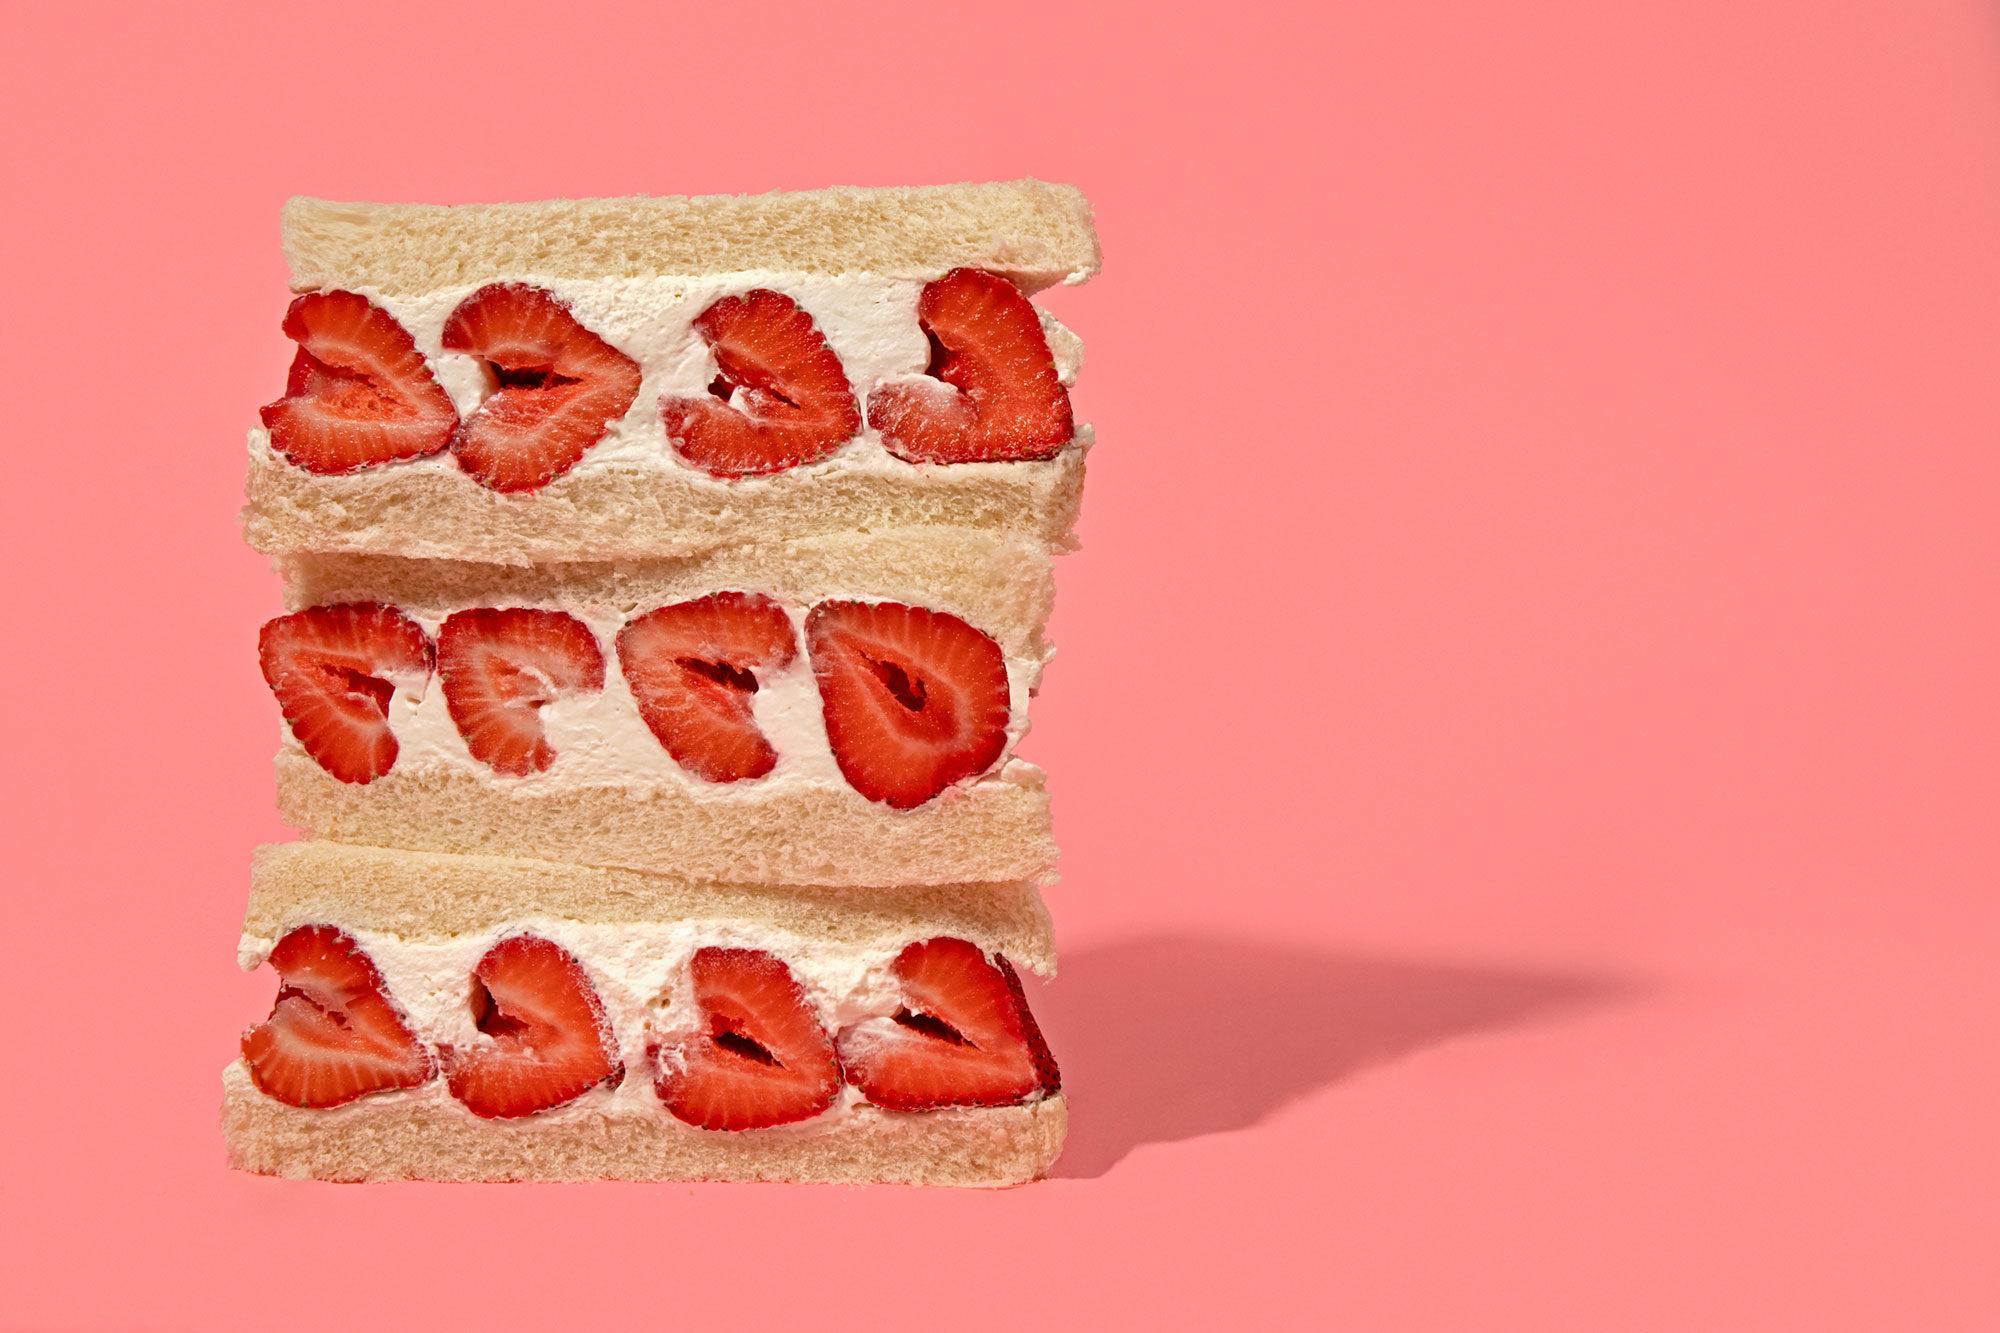 Article-Japanese-Fruit-Sando-Whipped-Cream-Strawberry-dessert-Recipe